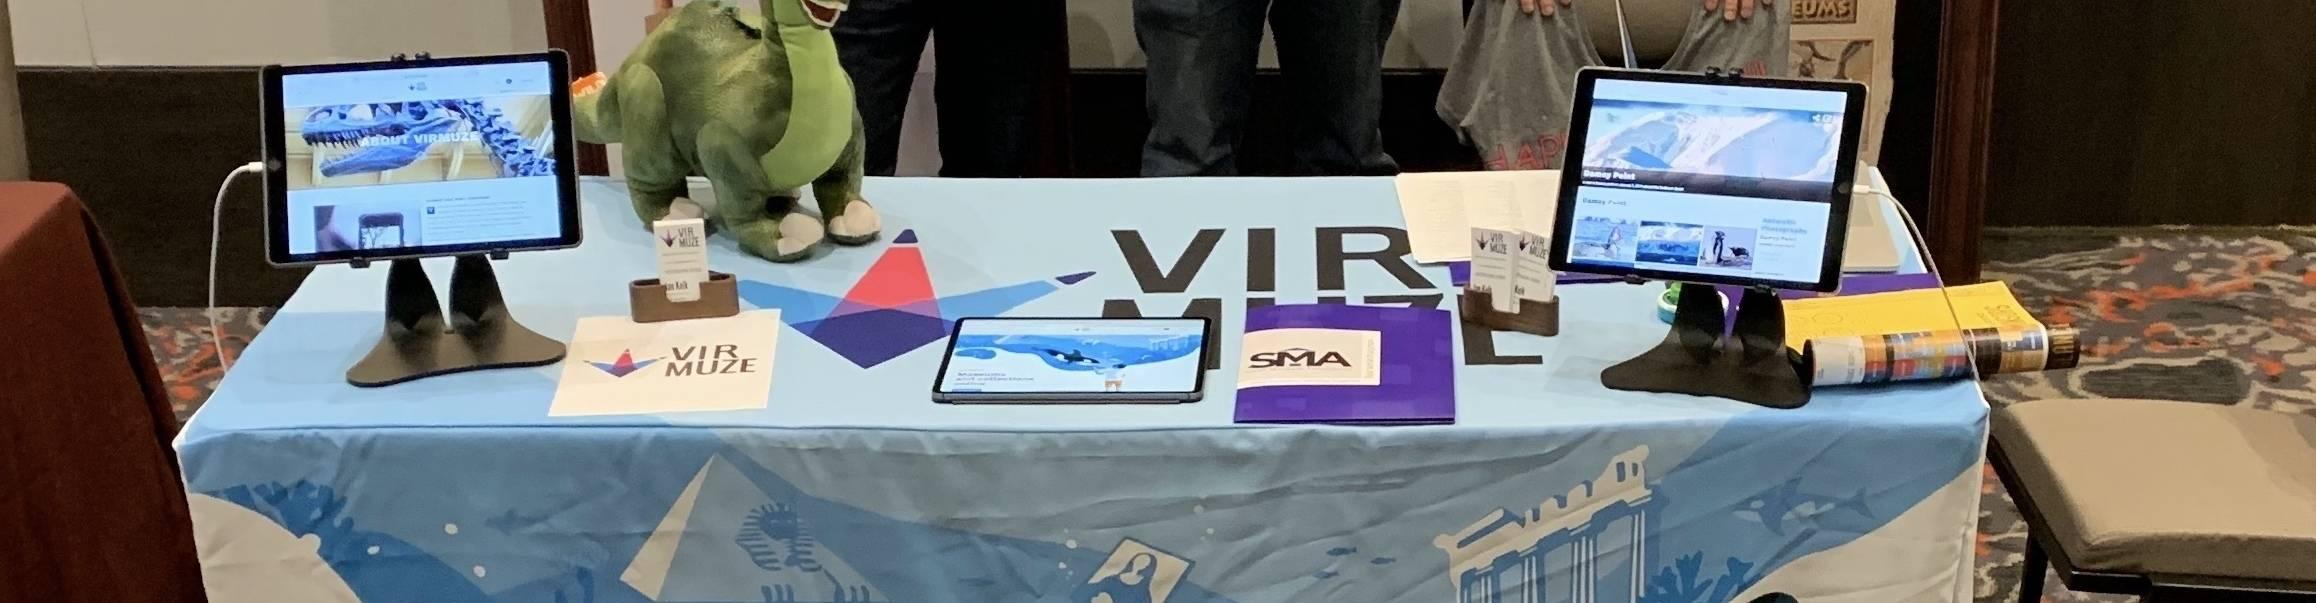 virmuze exhibit Small Museum Association 2019 Conference logo main banner